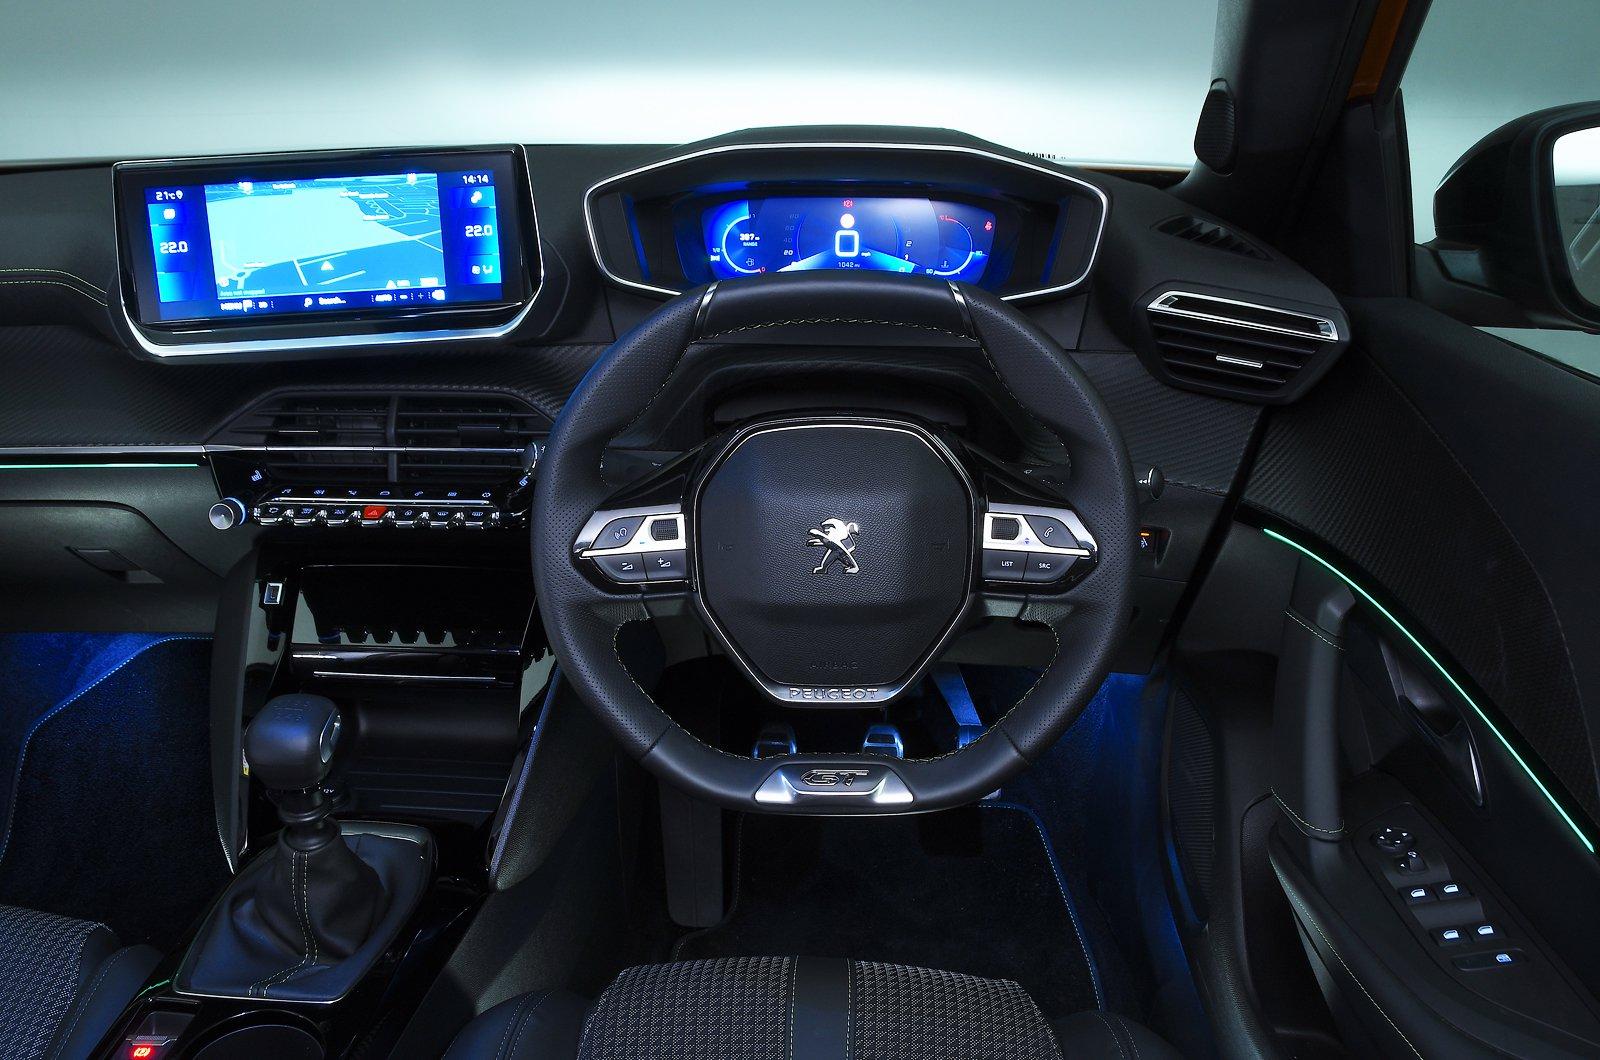 Peugeot 2008 2021 RHD dashboard